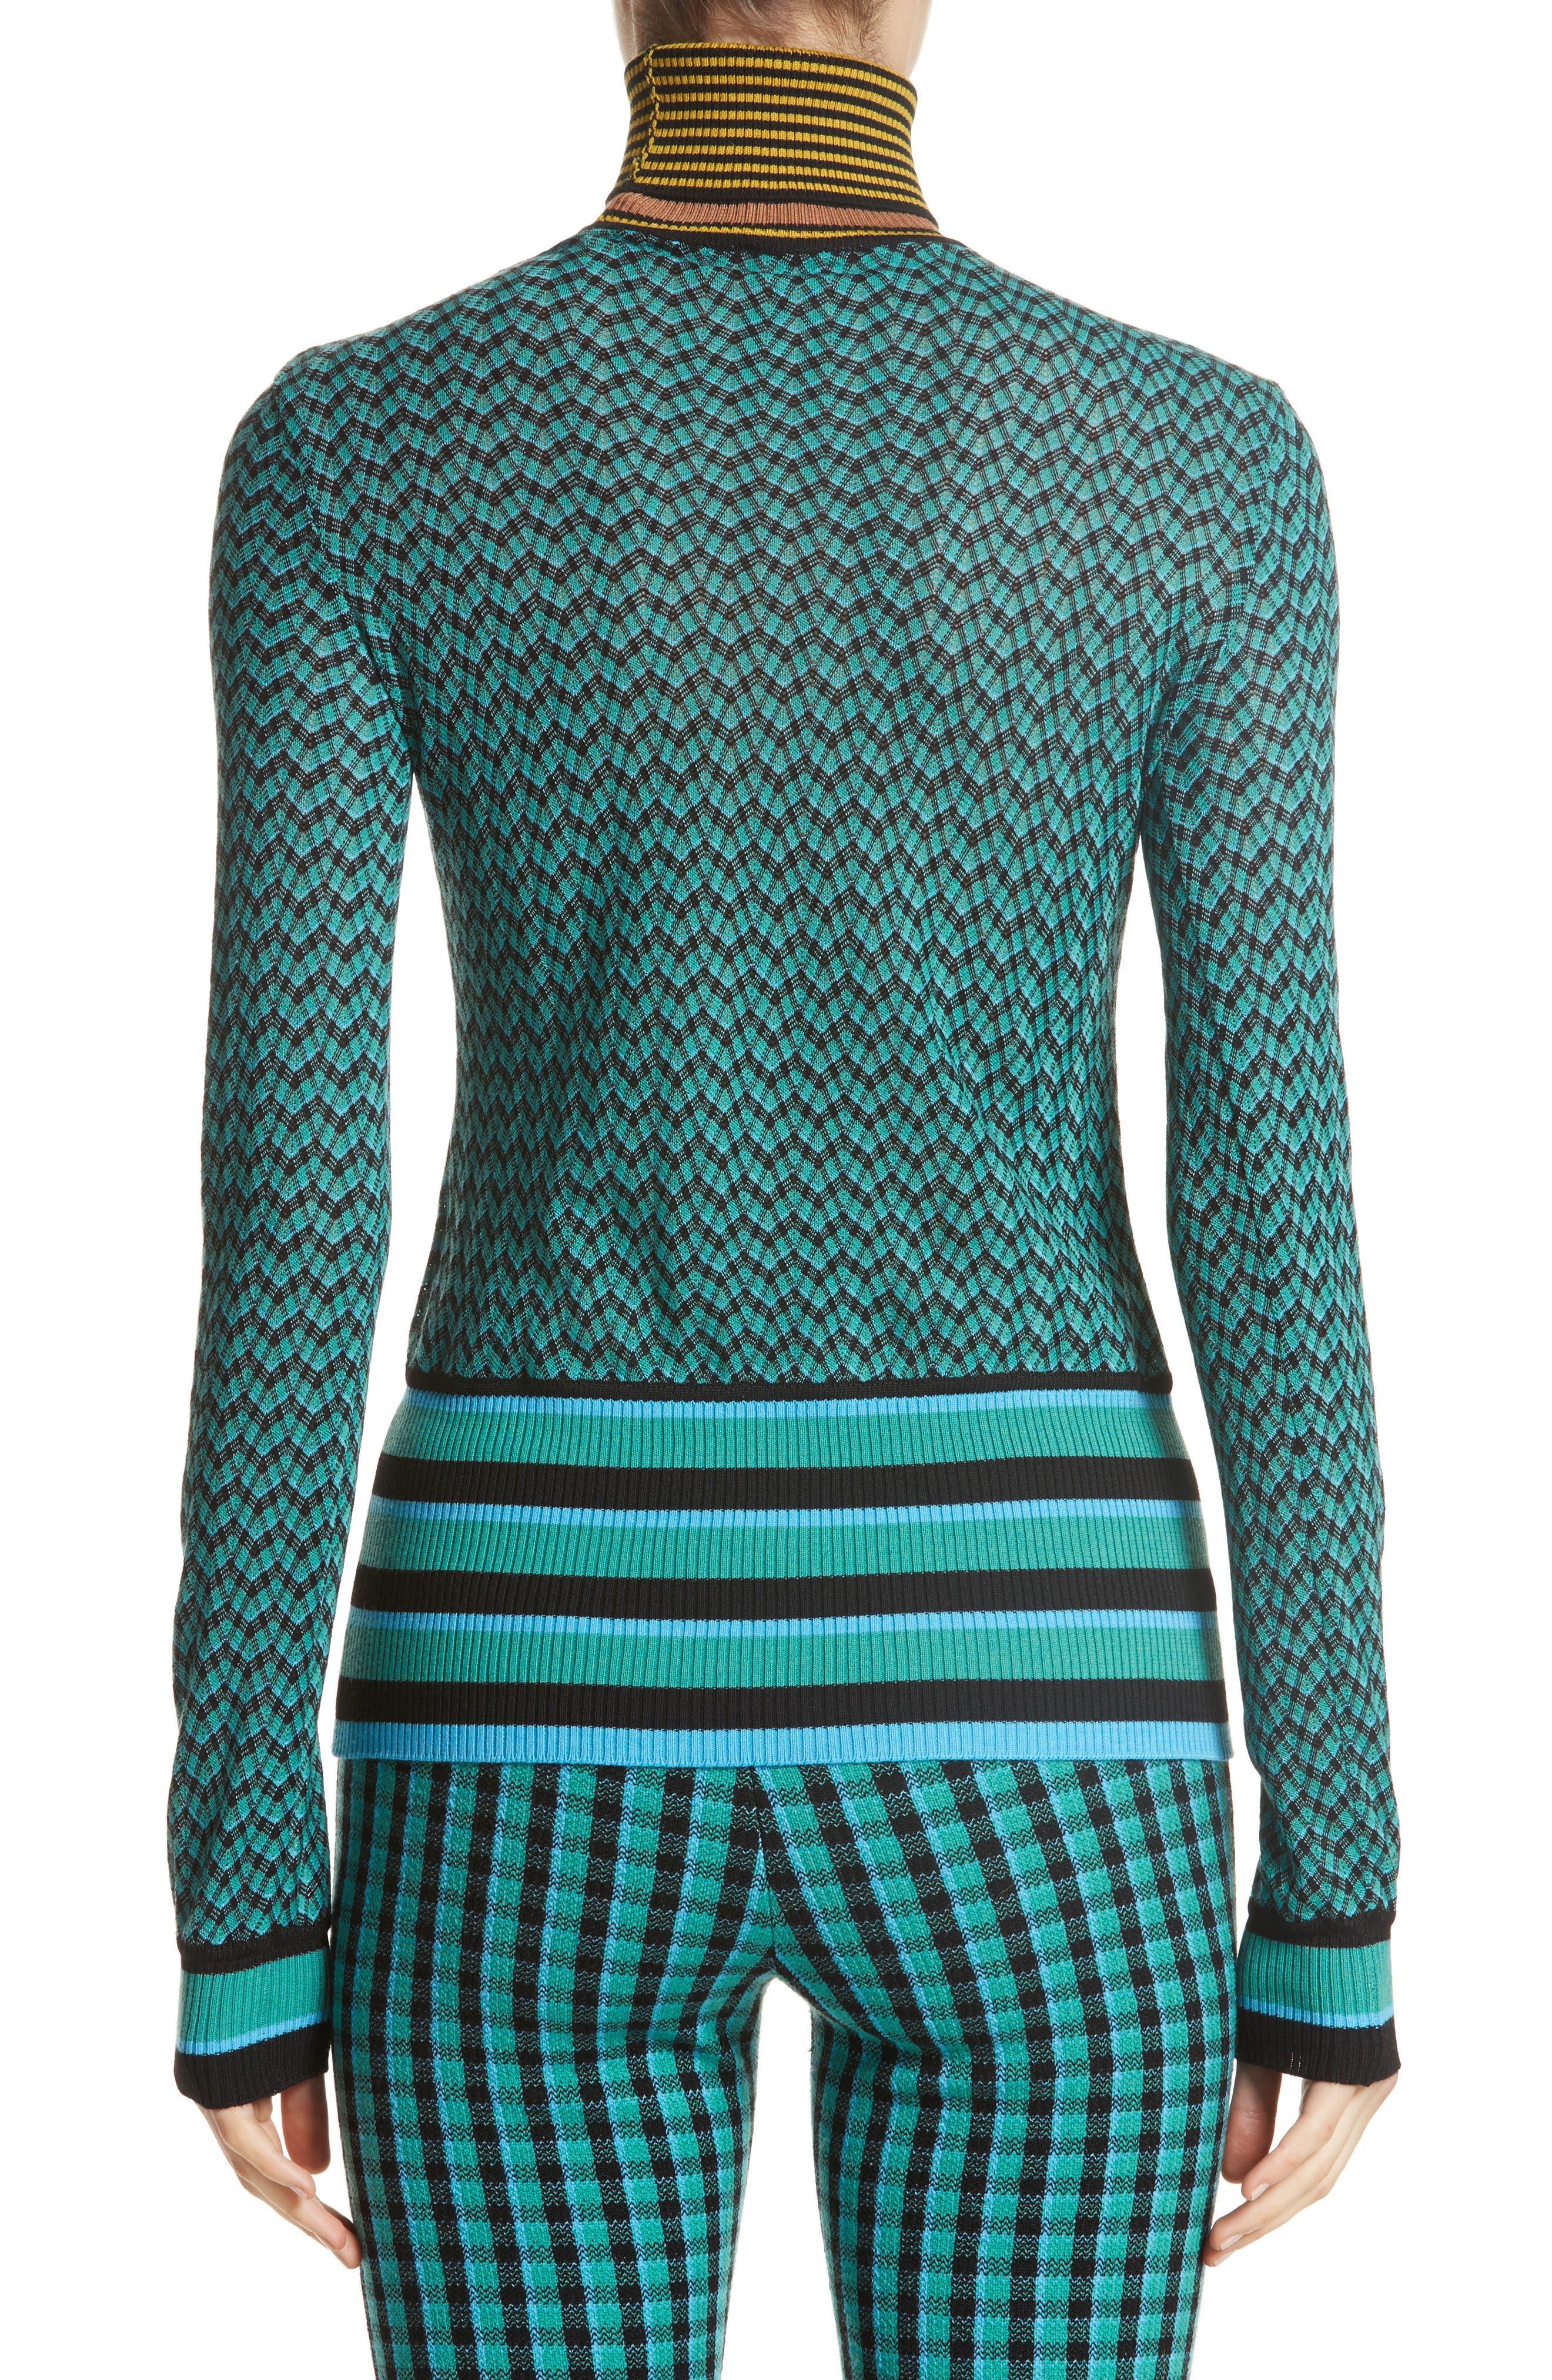 Zigzag & Stripe Mock Neck Sweater,                             Alternate thumbnail 2, color,                             440